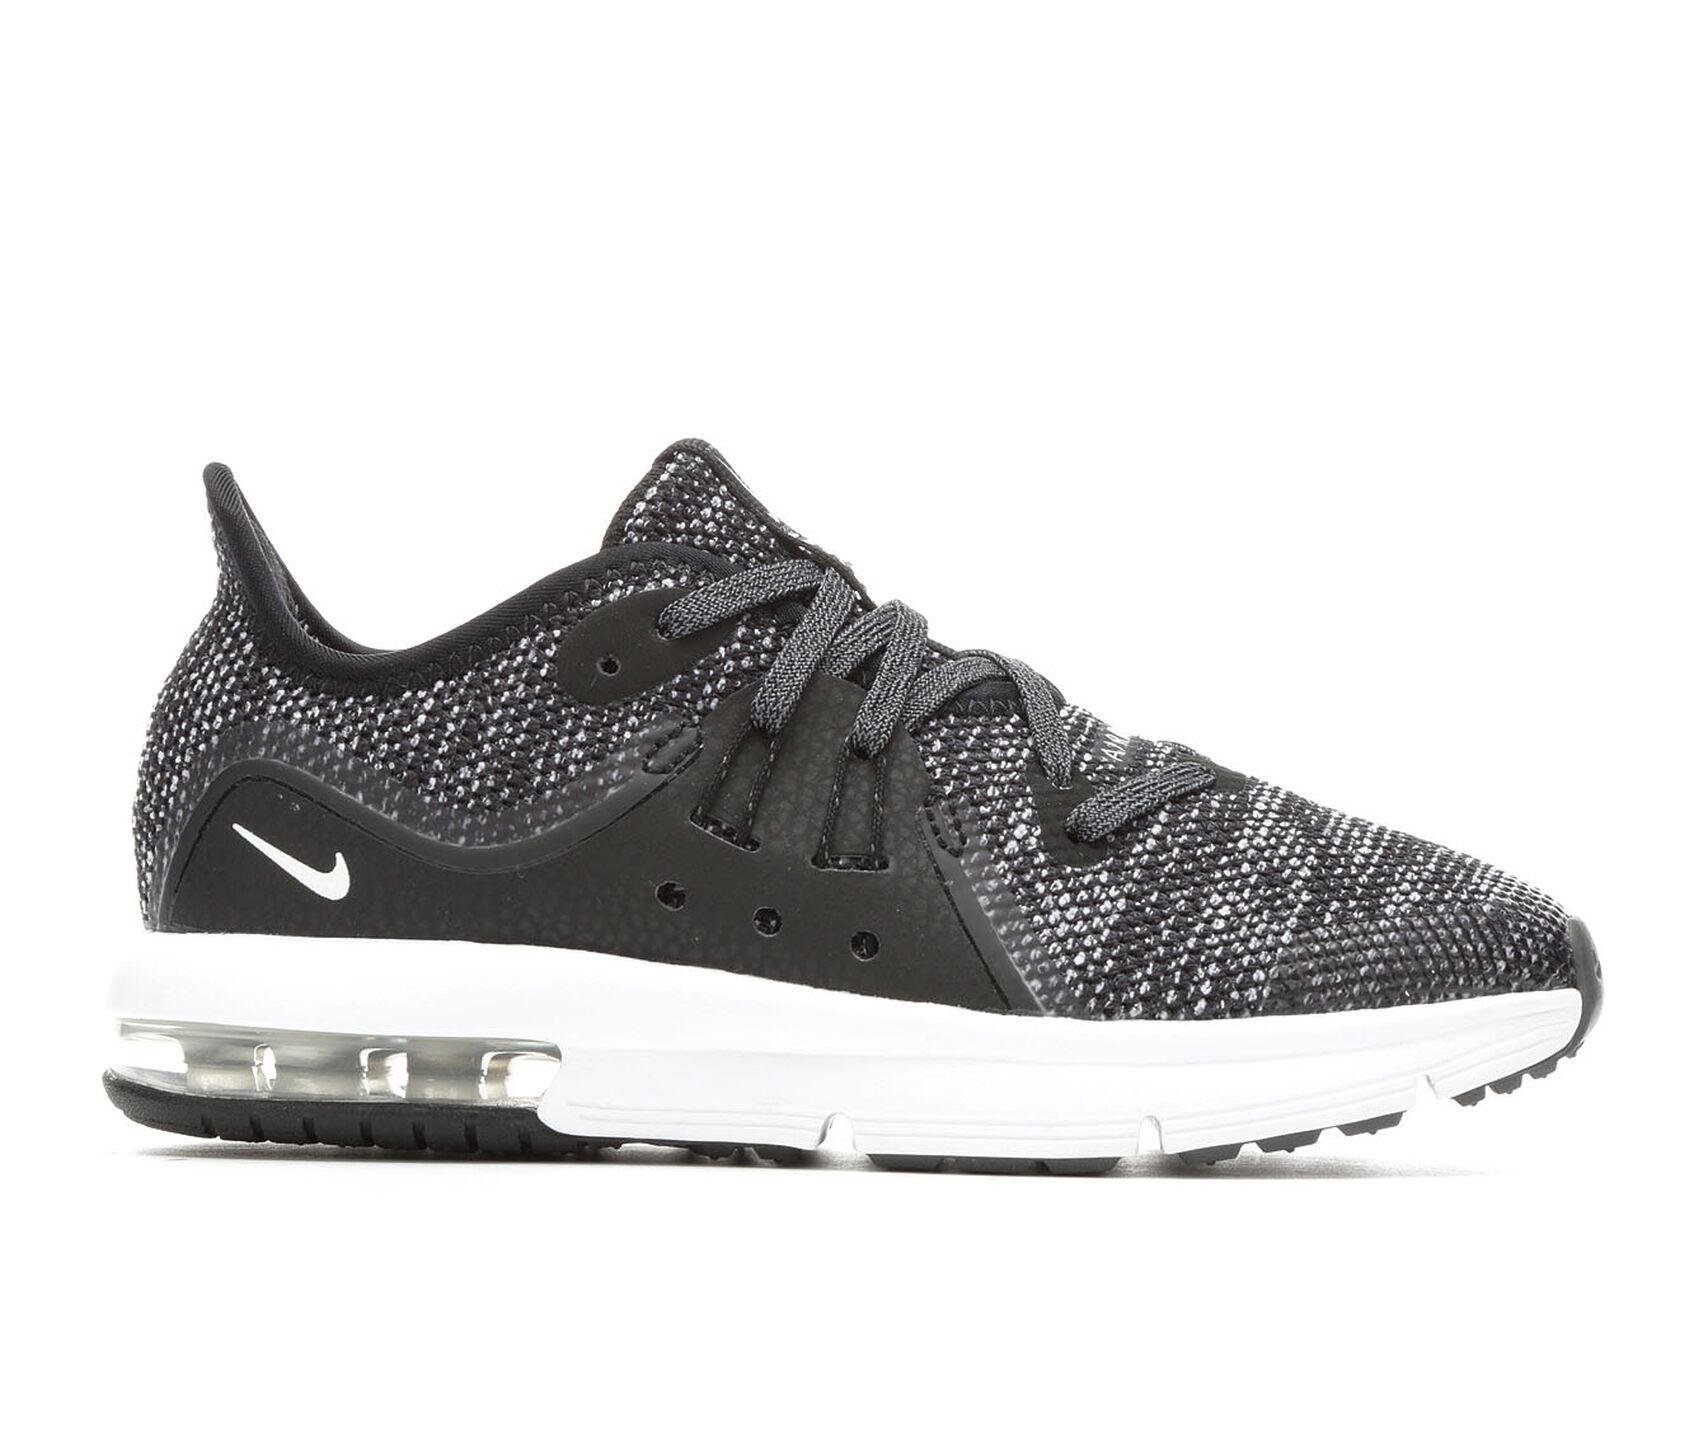 ... Nike Little Kid Air Max Sequent 3 Running Shoes. Carousel Controls  Previous d431380e58